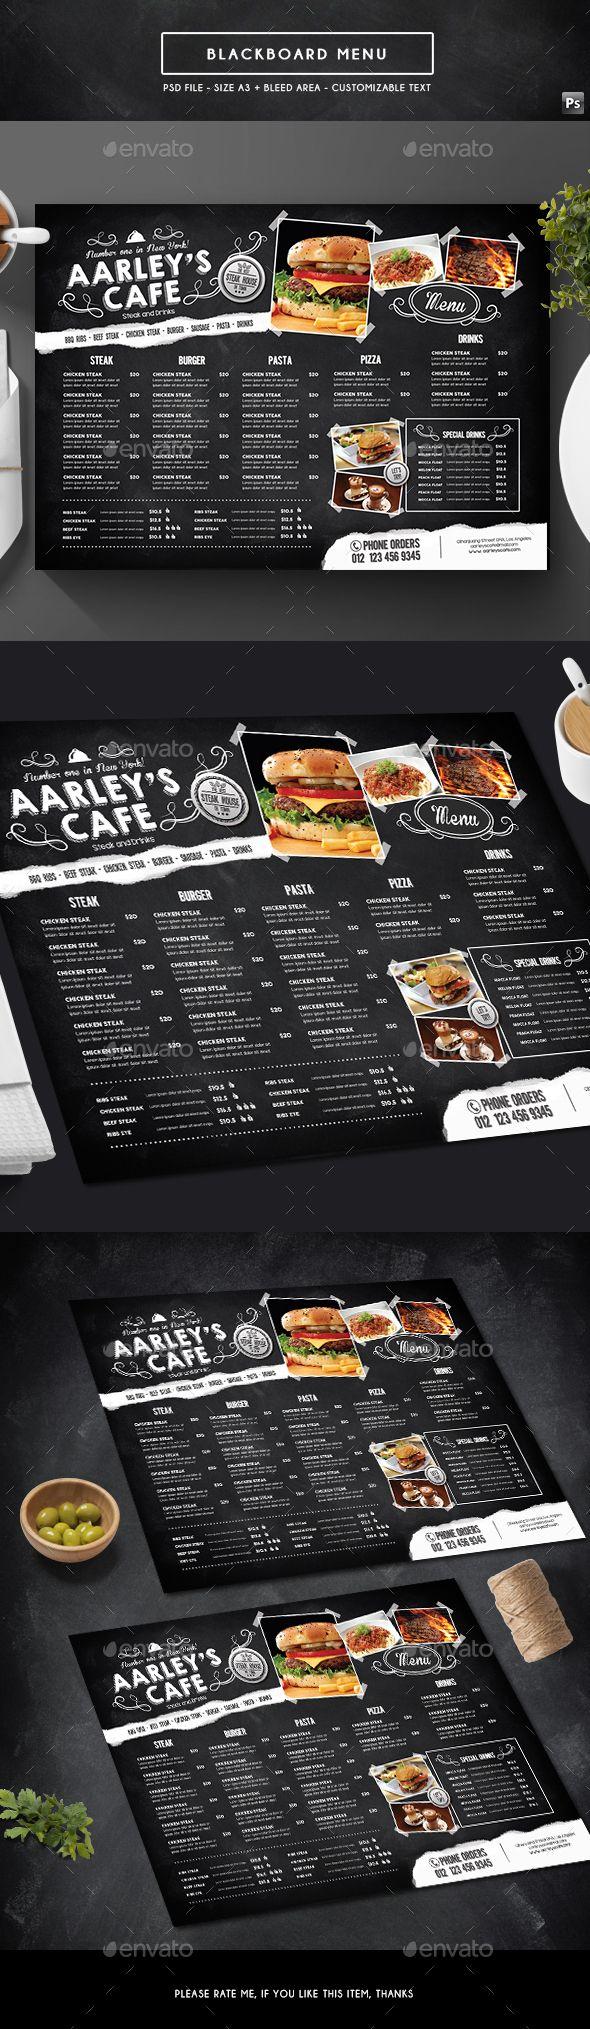 Blackboard Menu - Food Menus Print Templates Download here : https://graphicriver.net/item/blackboard-menu/19305671?s_rank=64&ref=Al-fatih